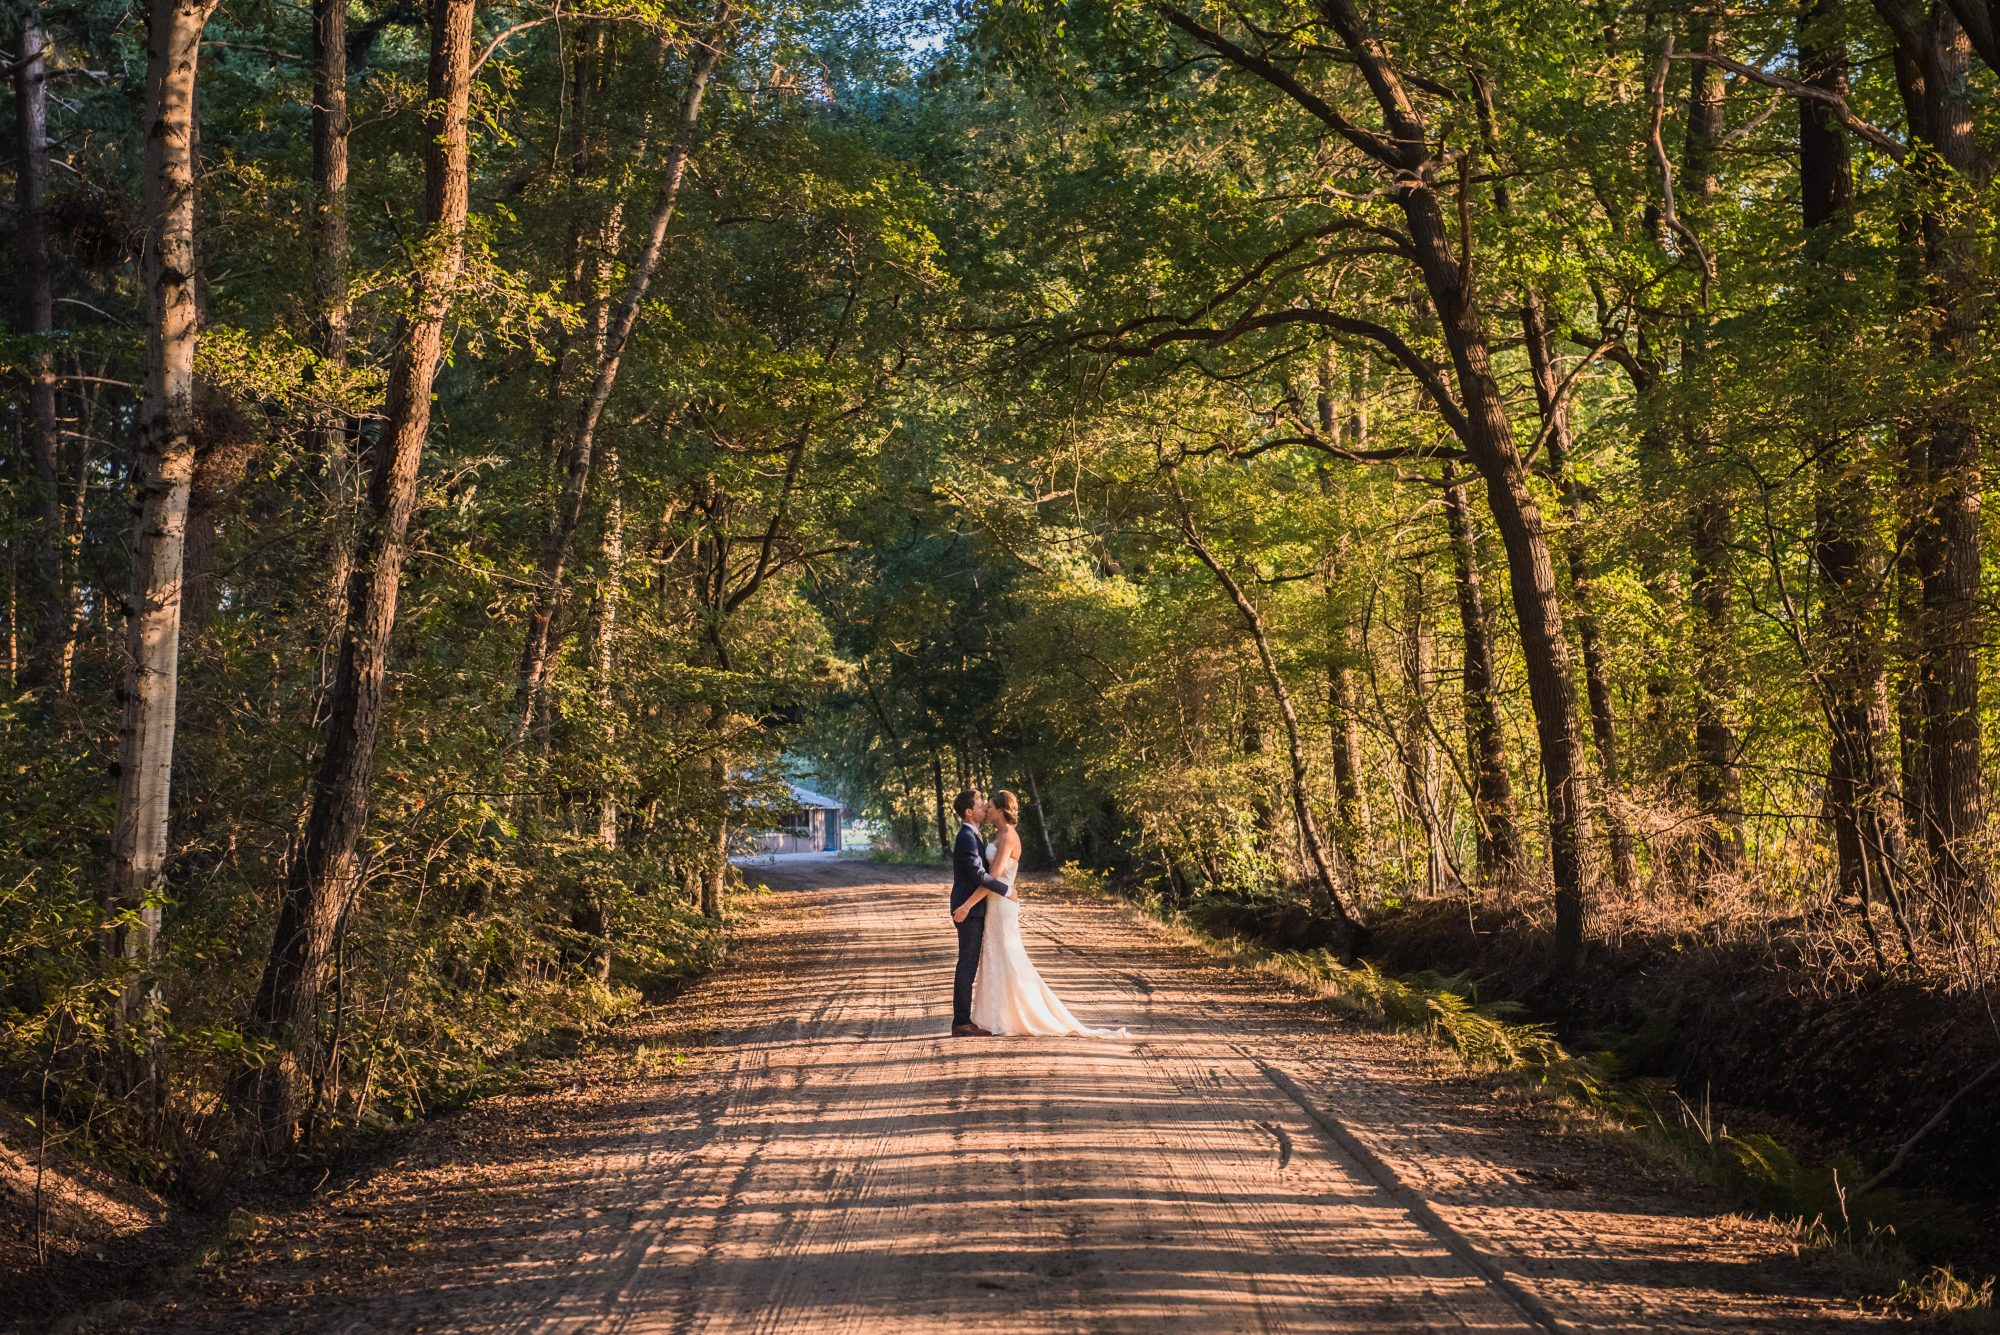 bruiloft-roland-annewil-650